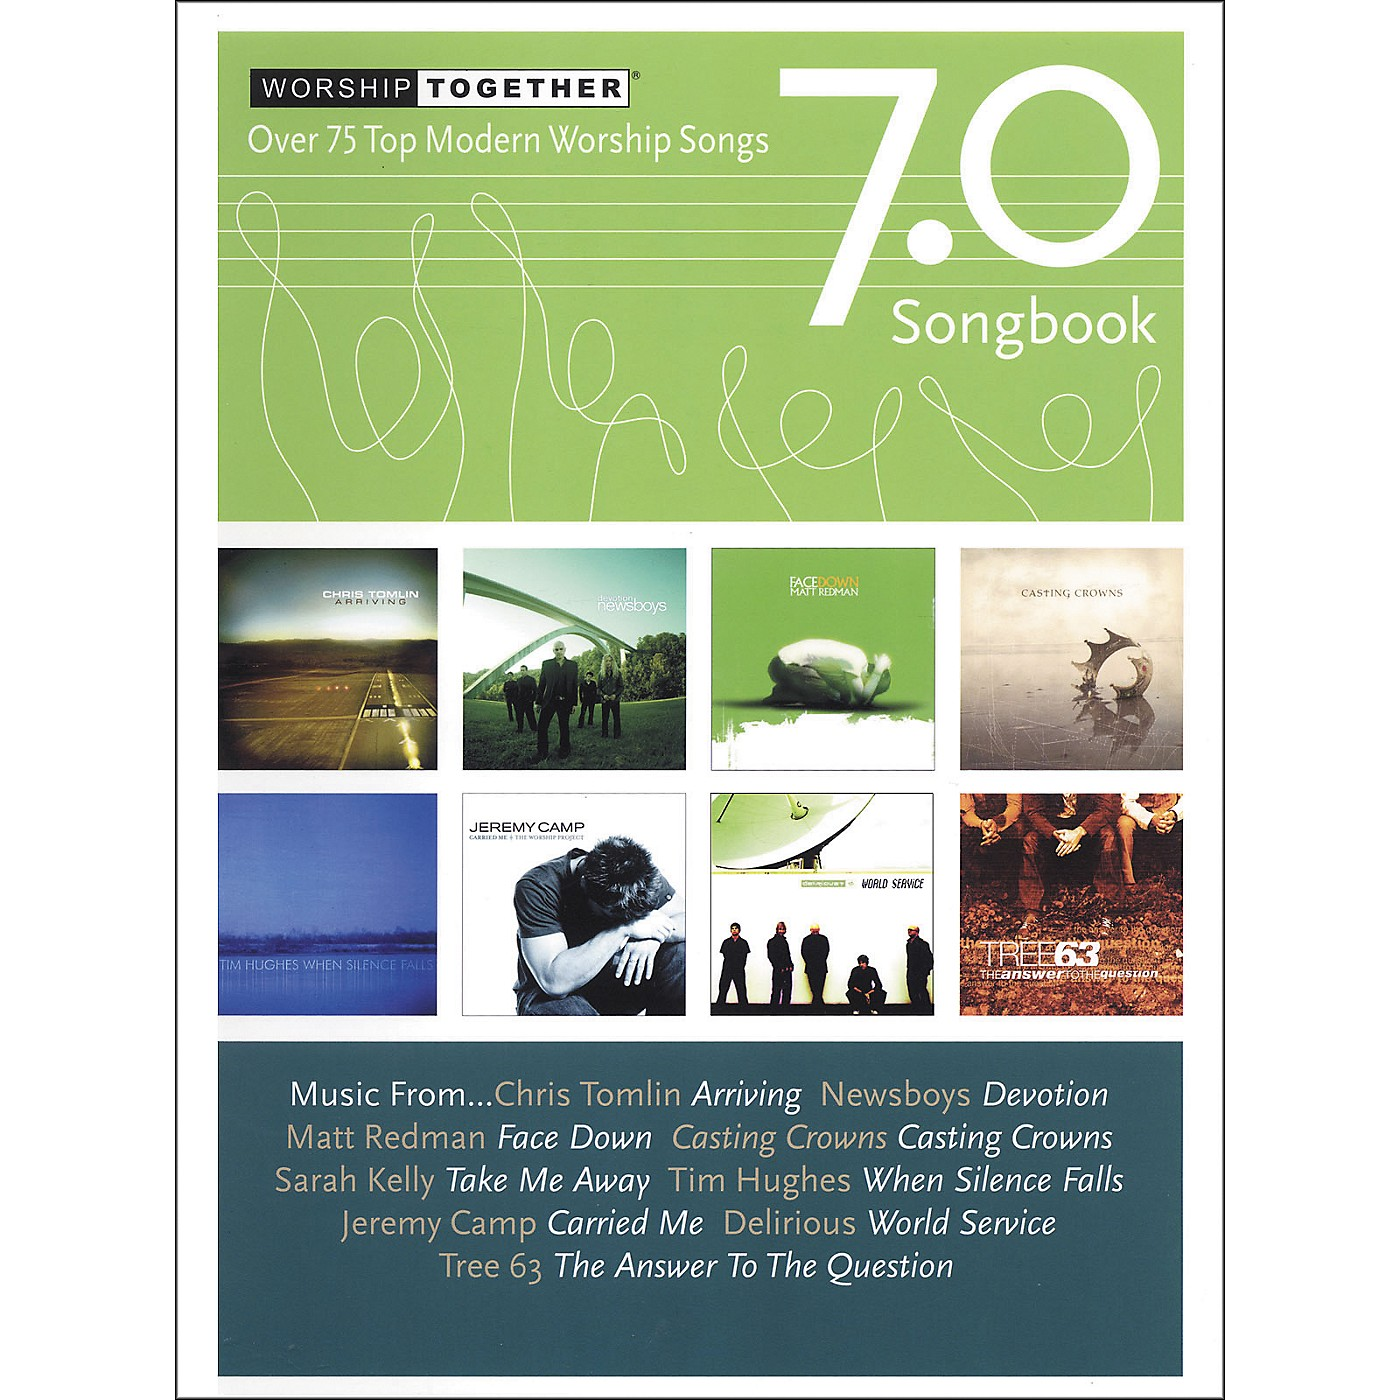 Hal Leonard Worship Together 7.0 Piano, Vocal, Guitar Songbook thumbnail